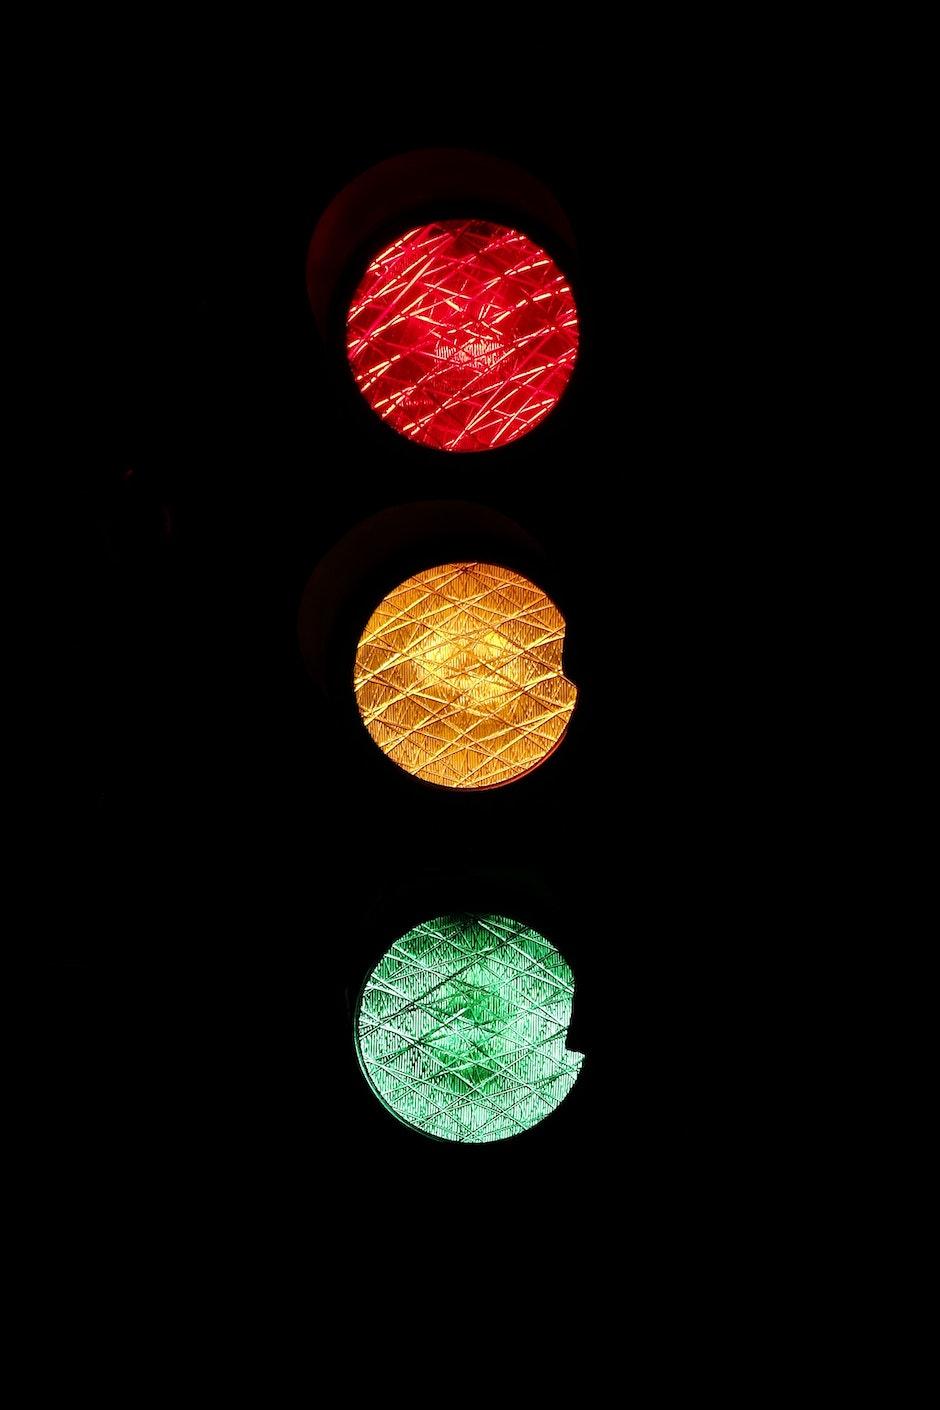 light, light signal, road sign